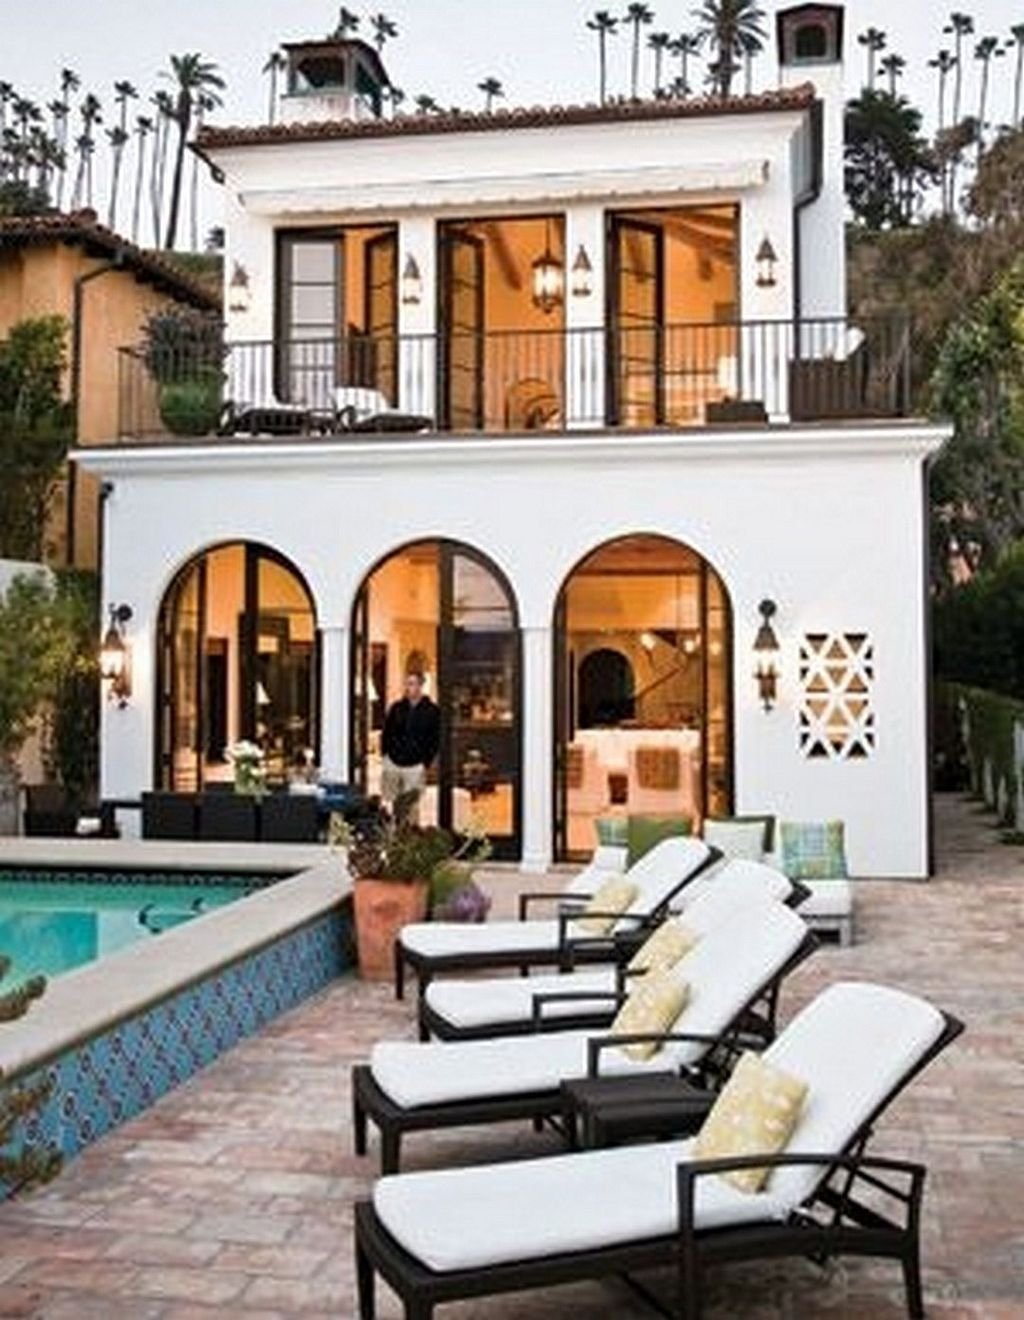 Awesome Modern Adobe House Exterior Design Ideas 84 Spanish Style Homes Modern Mediterranean Homes Spanish House